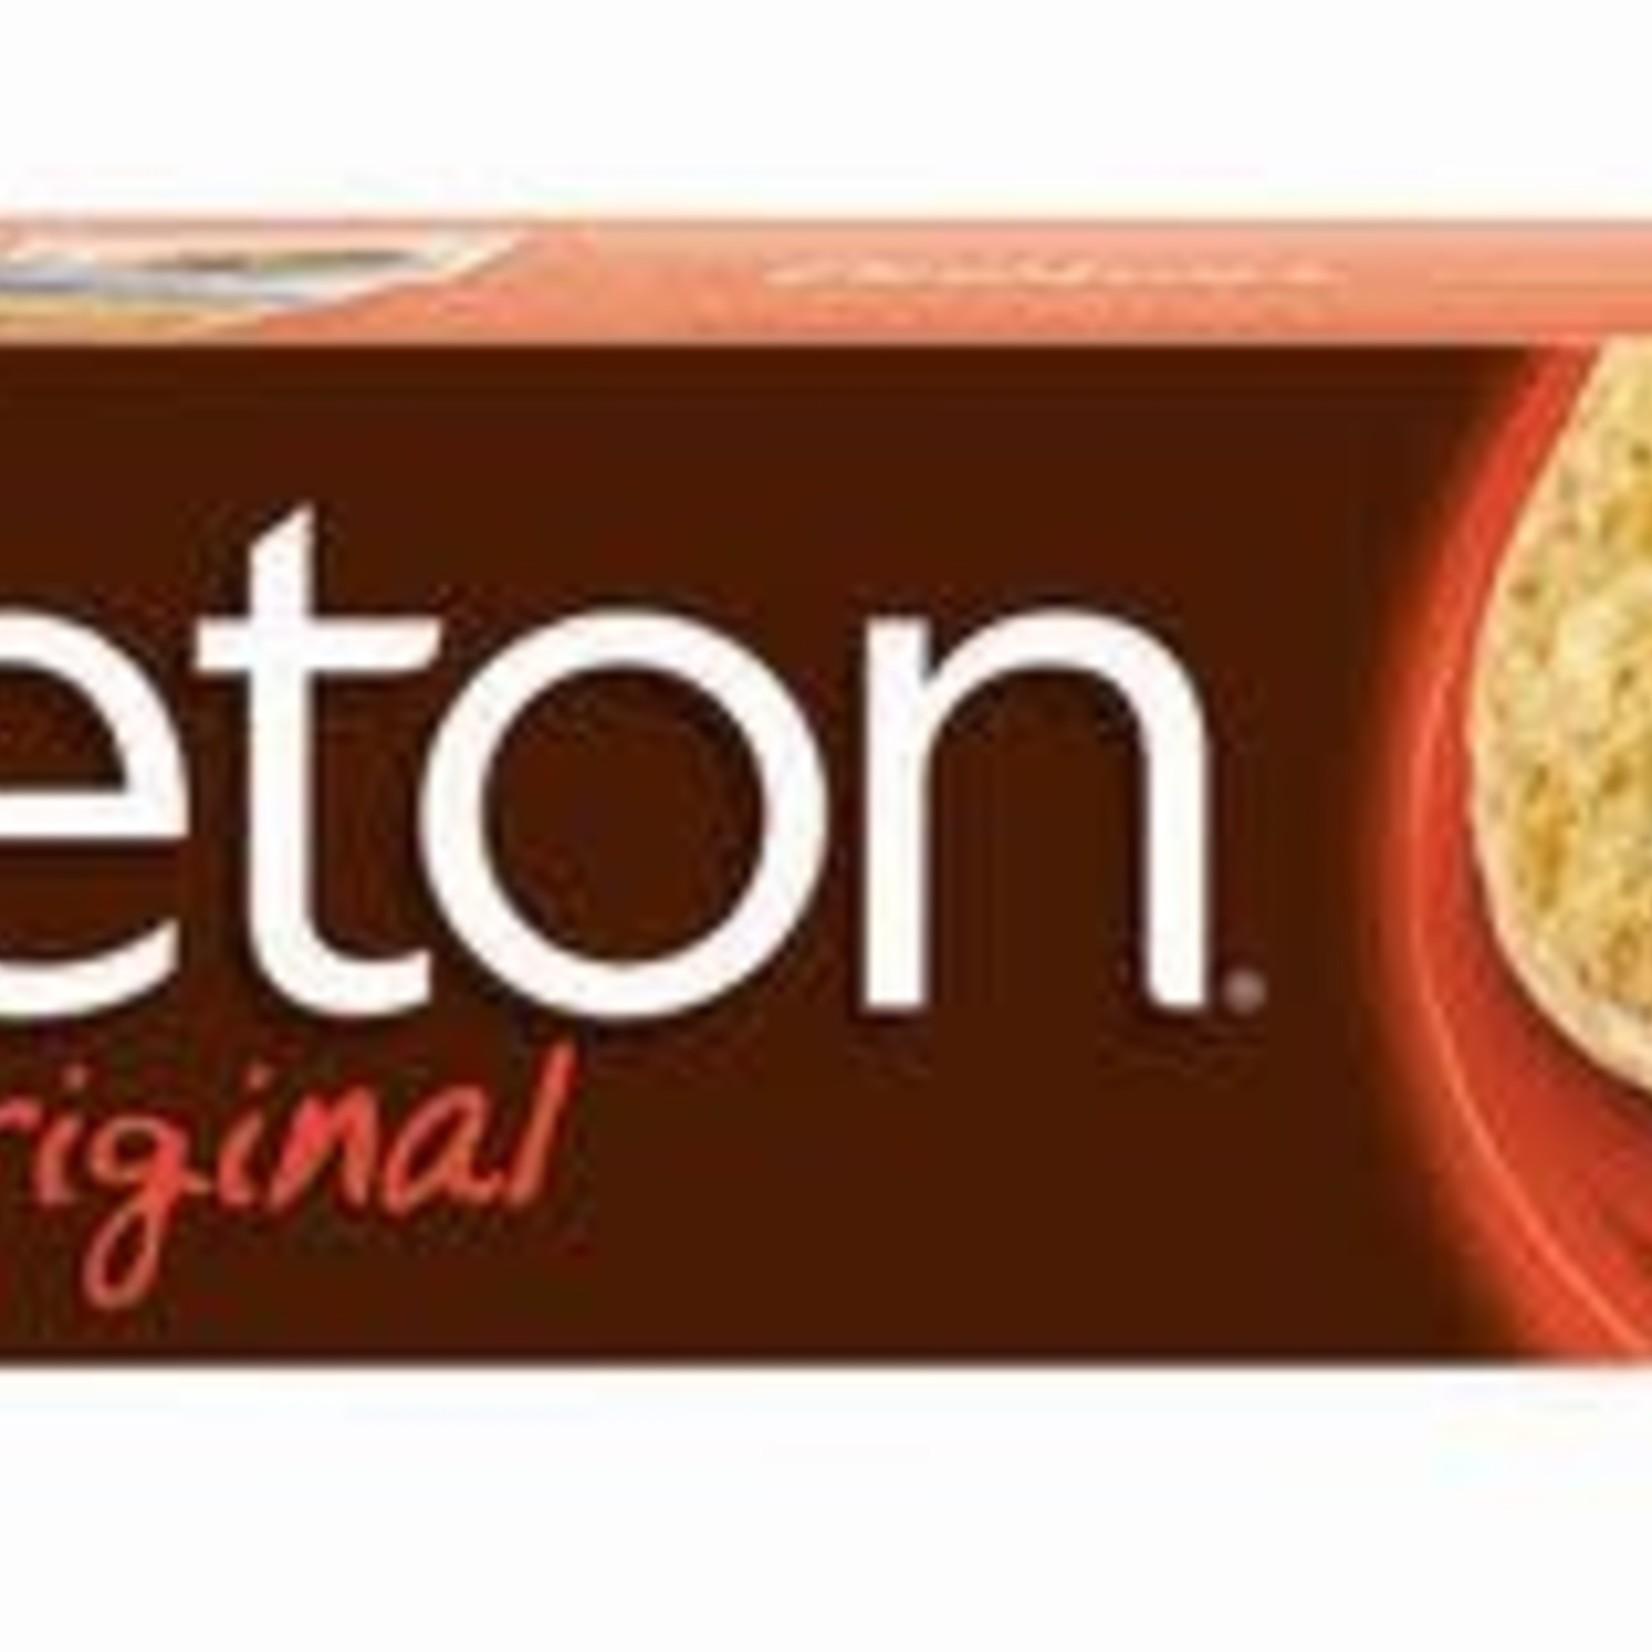 Breton Original Crackers 225g